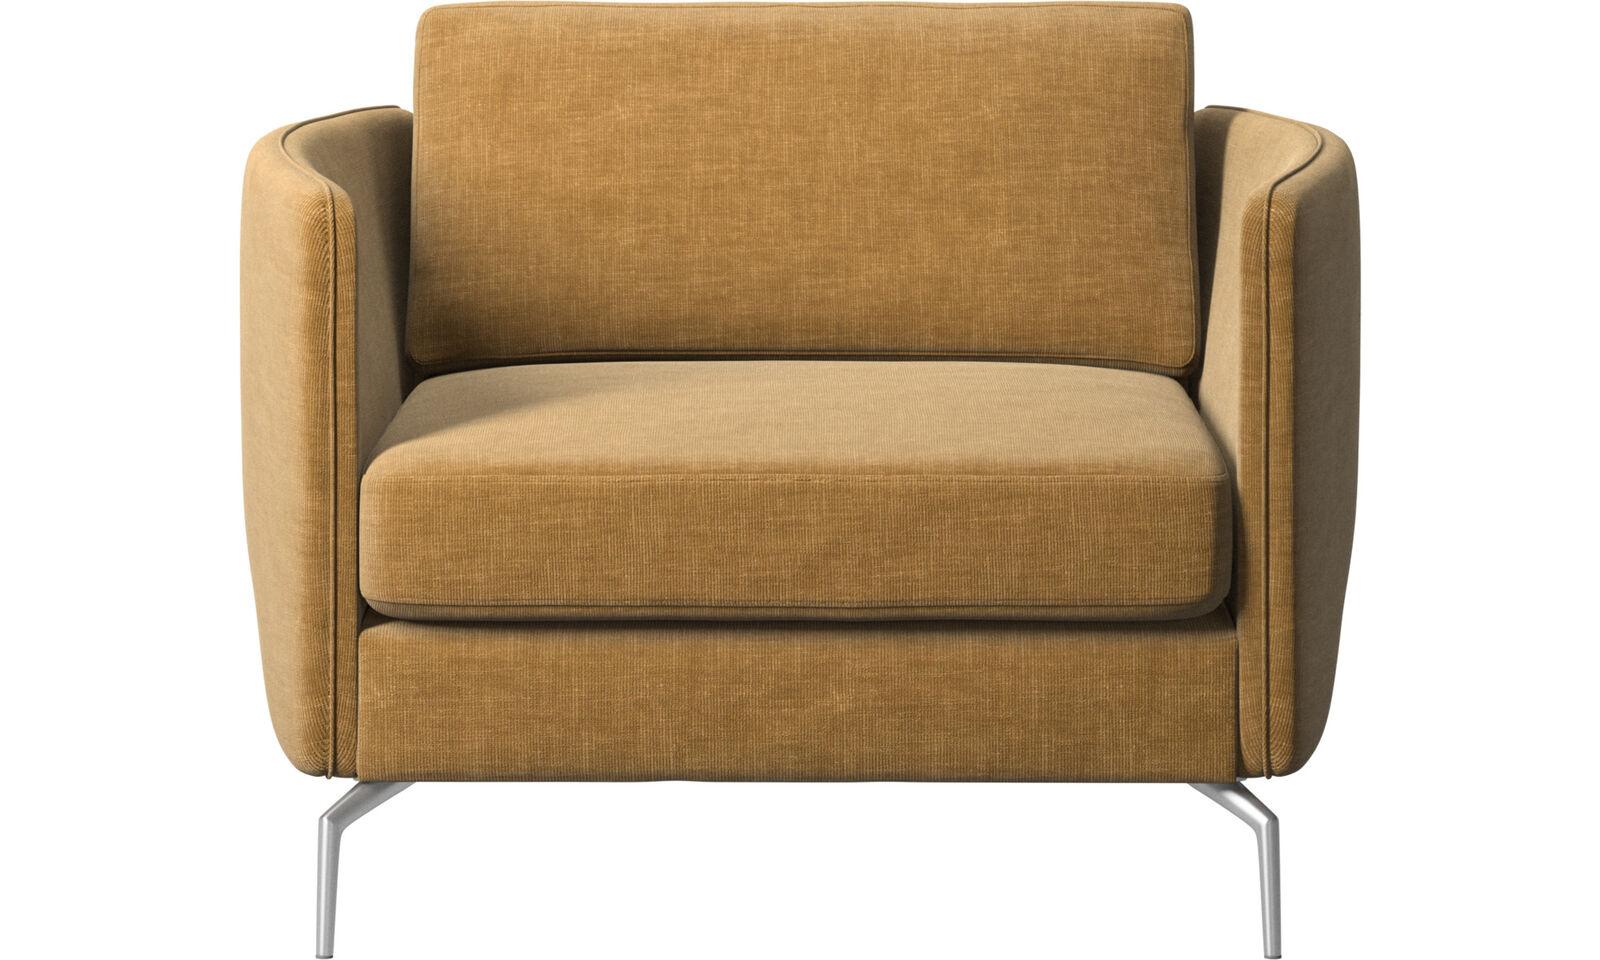 Osaka chair Golden Beige Napoli 2252-BRAND NEW